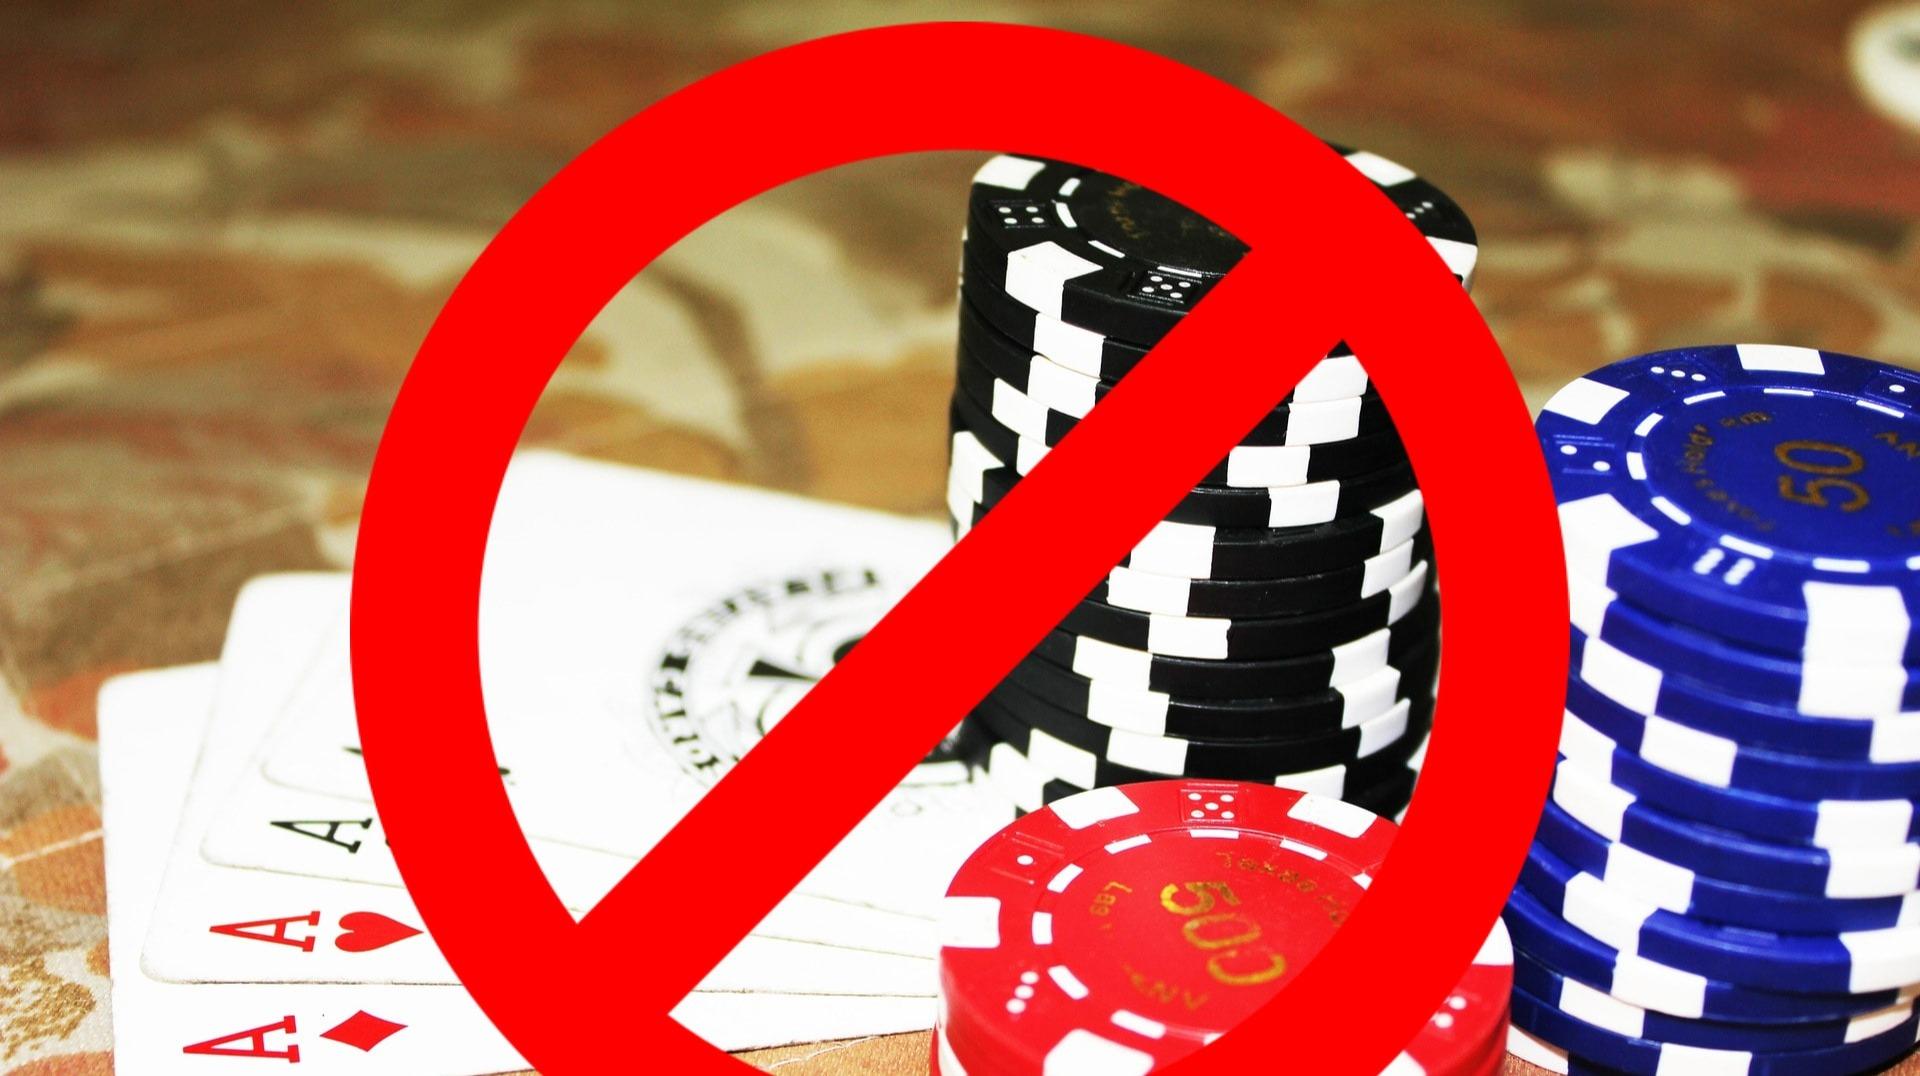 Ban the gambling , make it gone